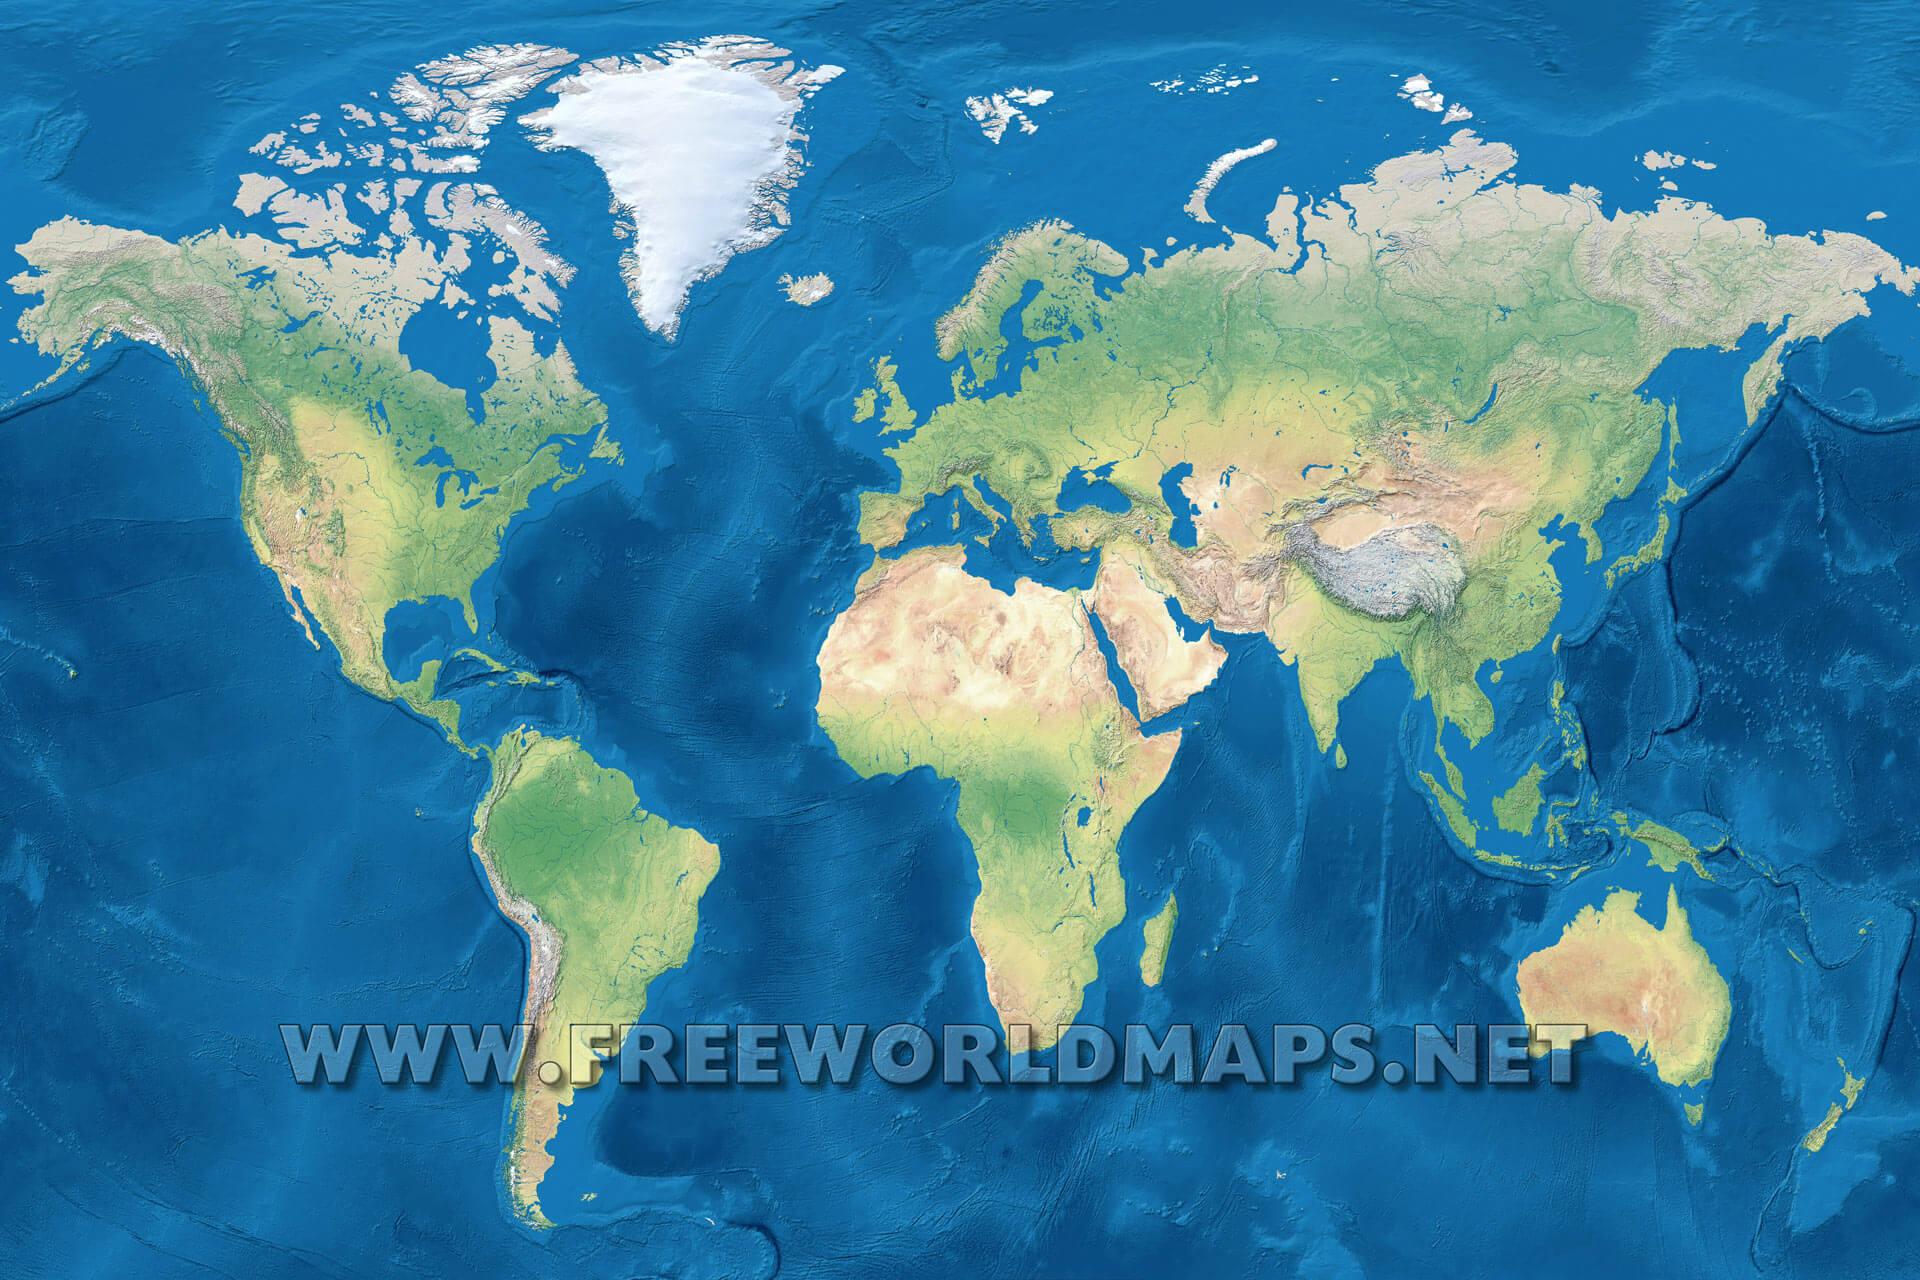 Emirates Wallpaper Hd Atlas Del Mundo Freeworldmaps Net